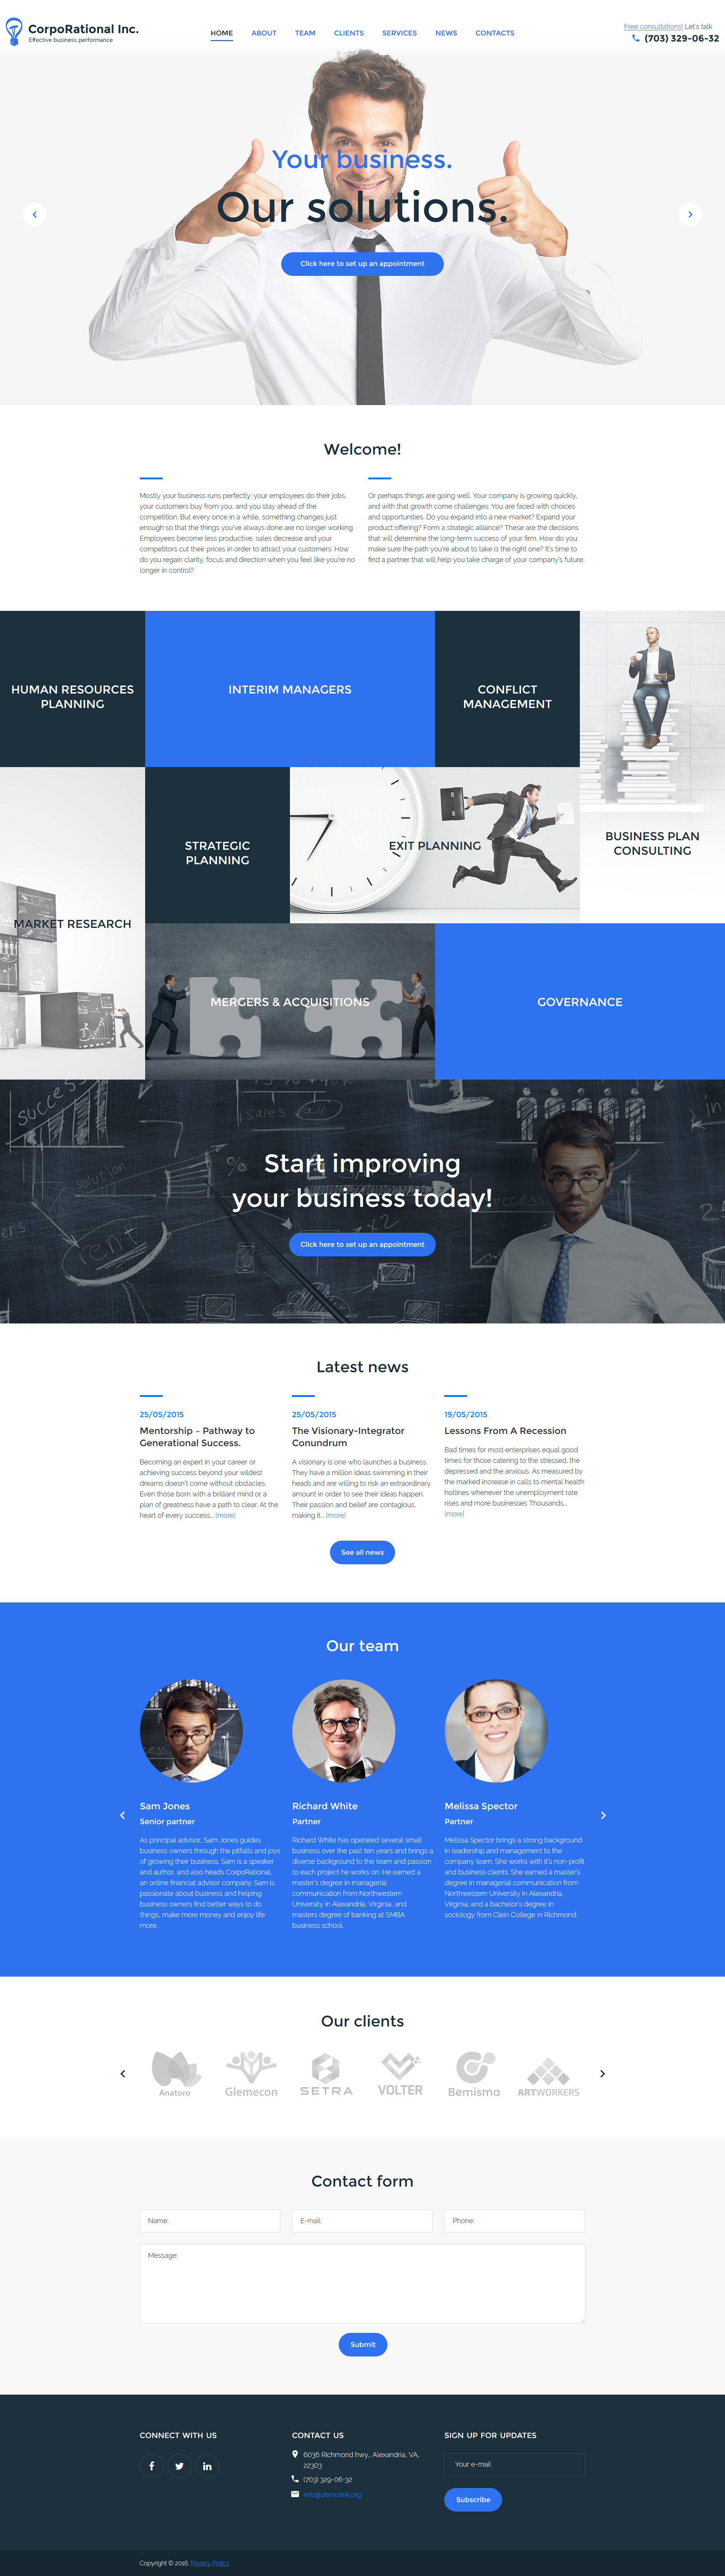 CorpoRational WordPress Theme - screenshot